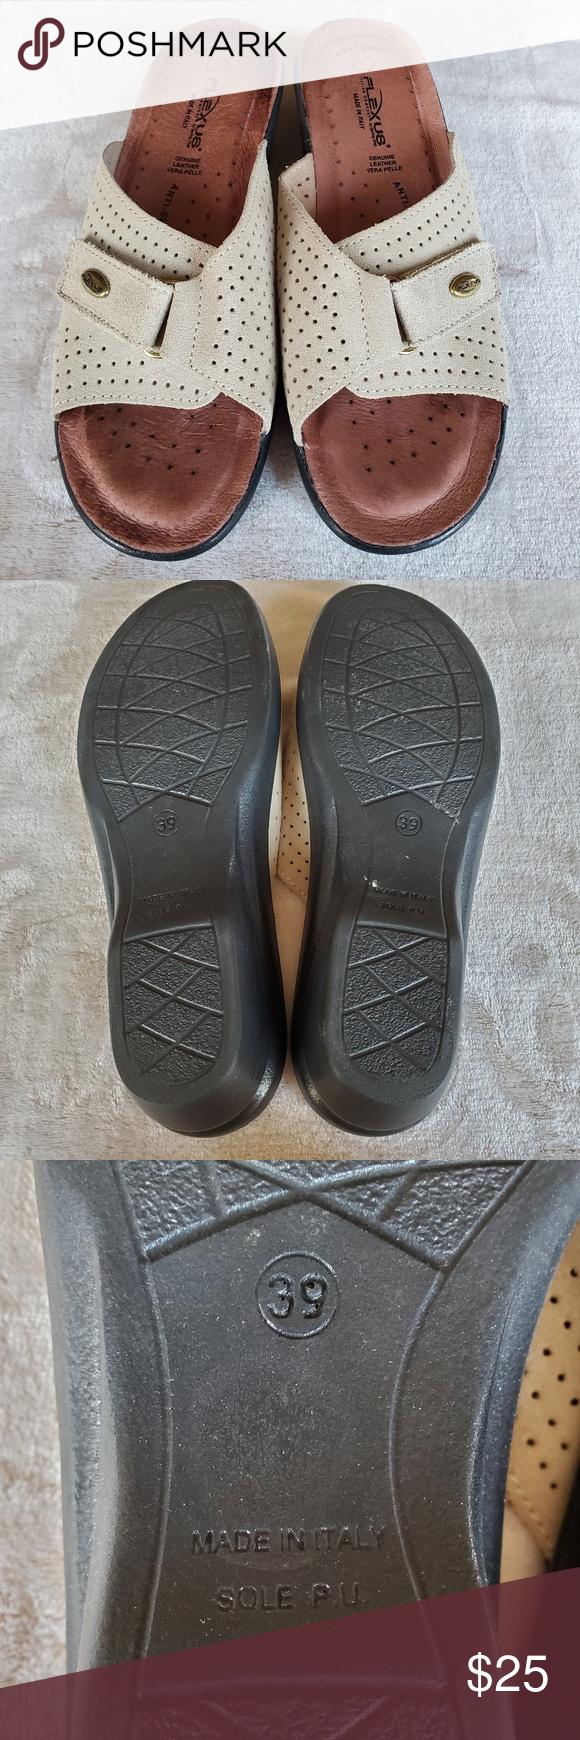 Italian Comfort Sandal Flexus Spring